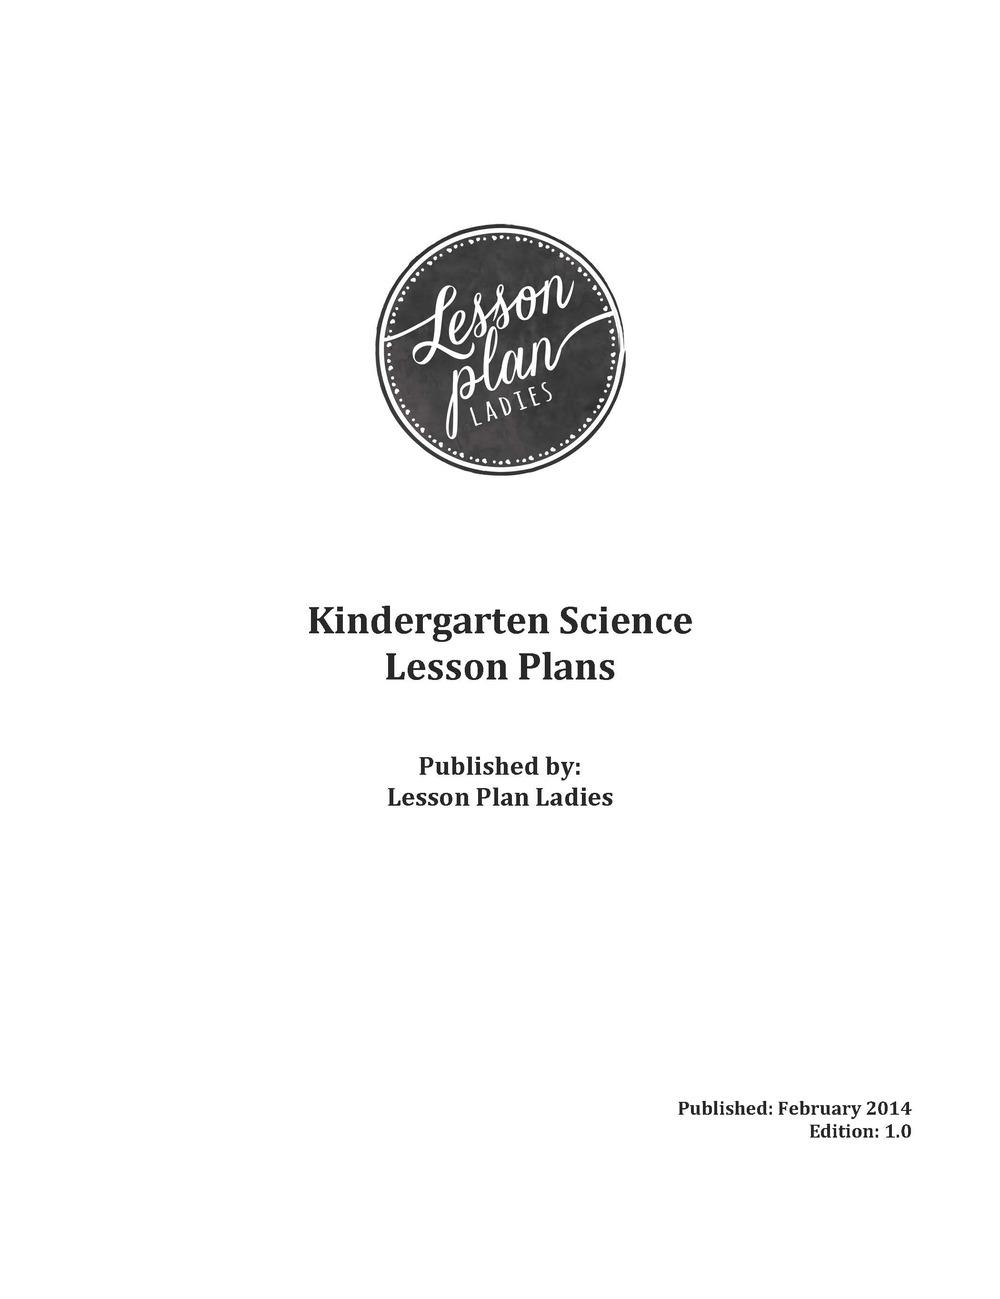 science lesson plans for kindergarten 5e lesson plans. Black Bedroom Furniture Sets. Home Design Ideas